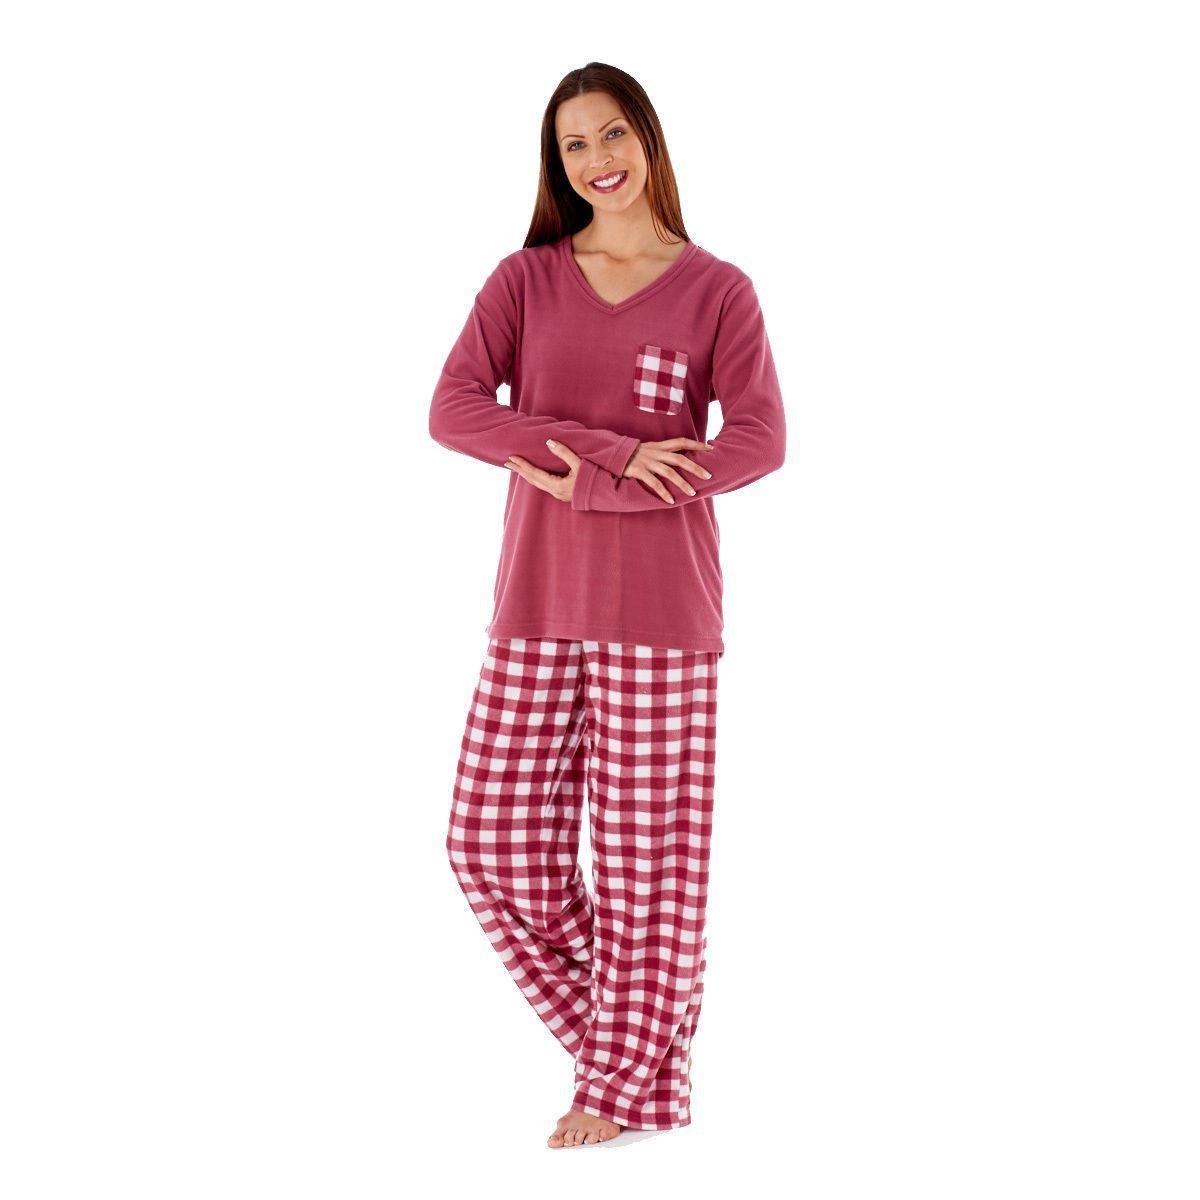 91538a227f6c Selena Secrets Ladies Fleece Pyjama Set - Cherry